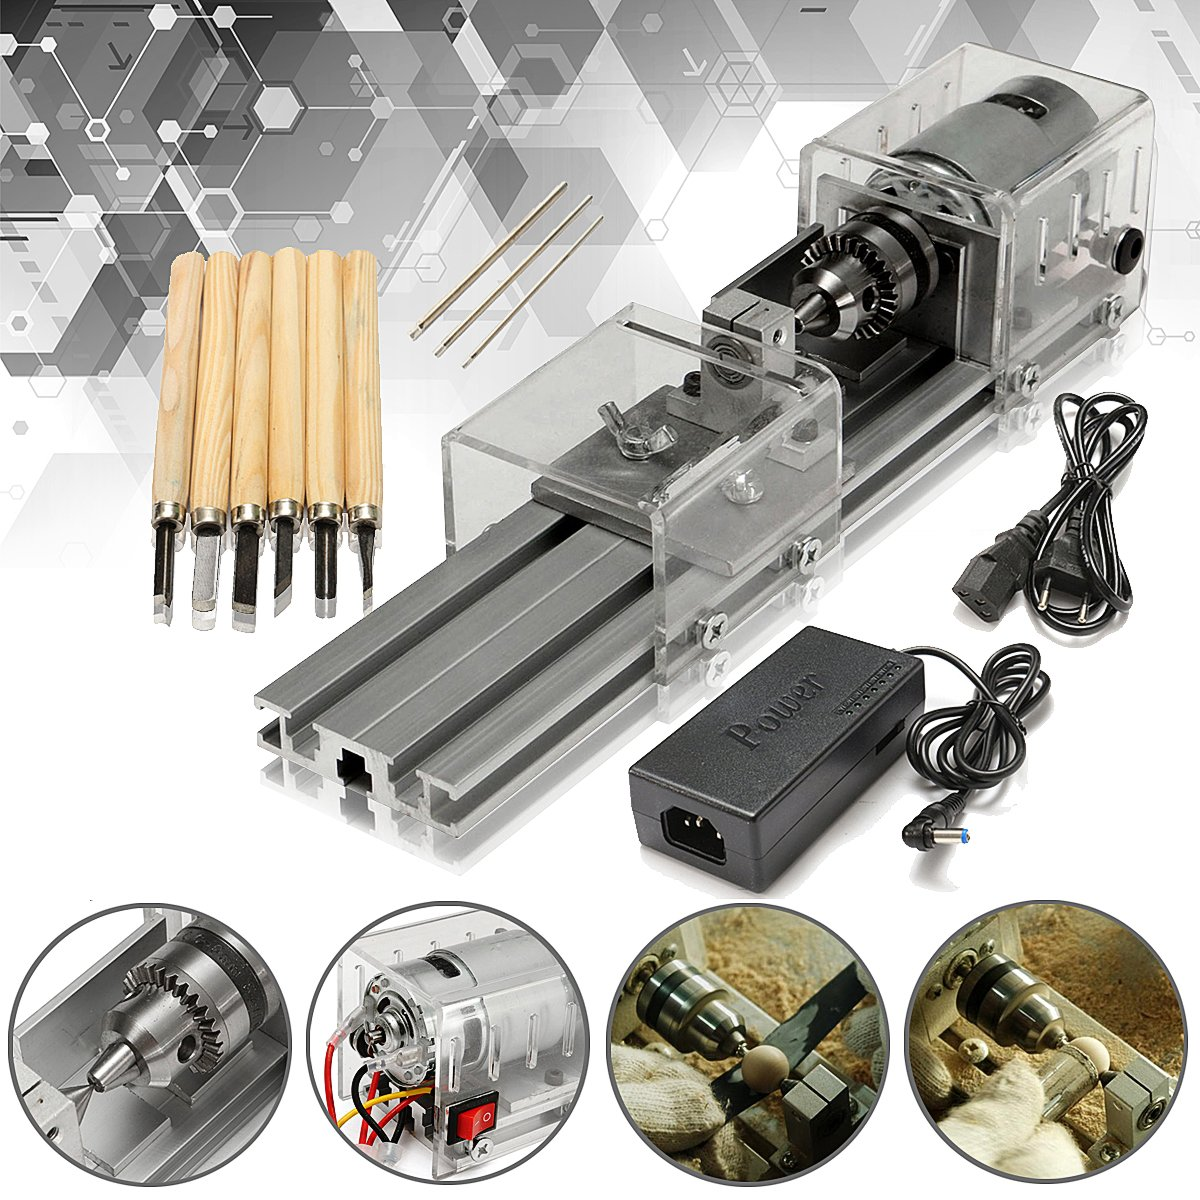 LB-01 Mini Lathe Beads Machine Woodworking DIY Lathe Polishing Drill Rotary Tool DC 24V